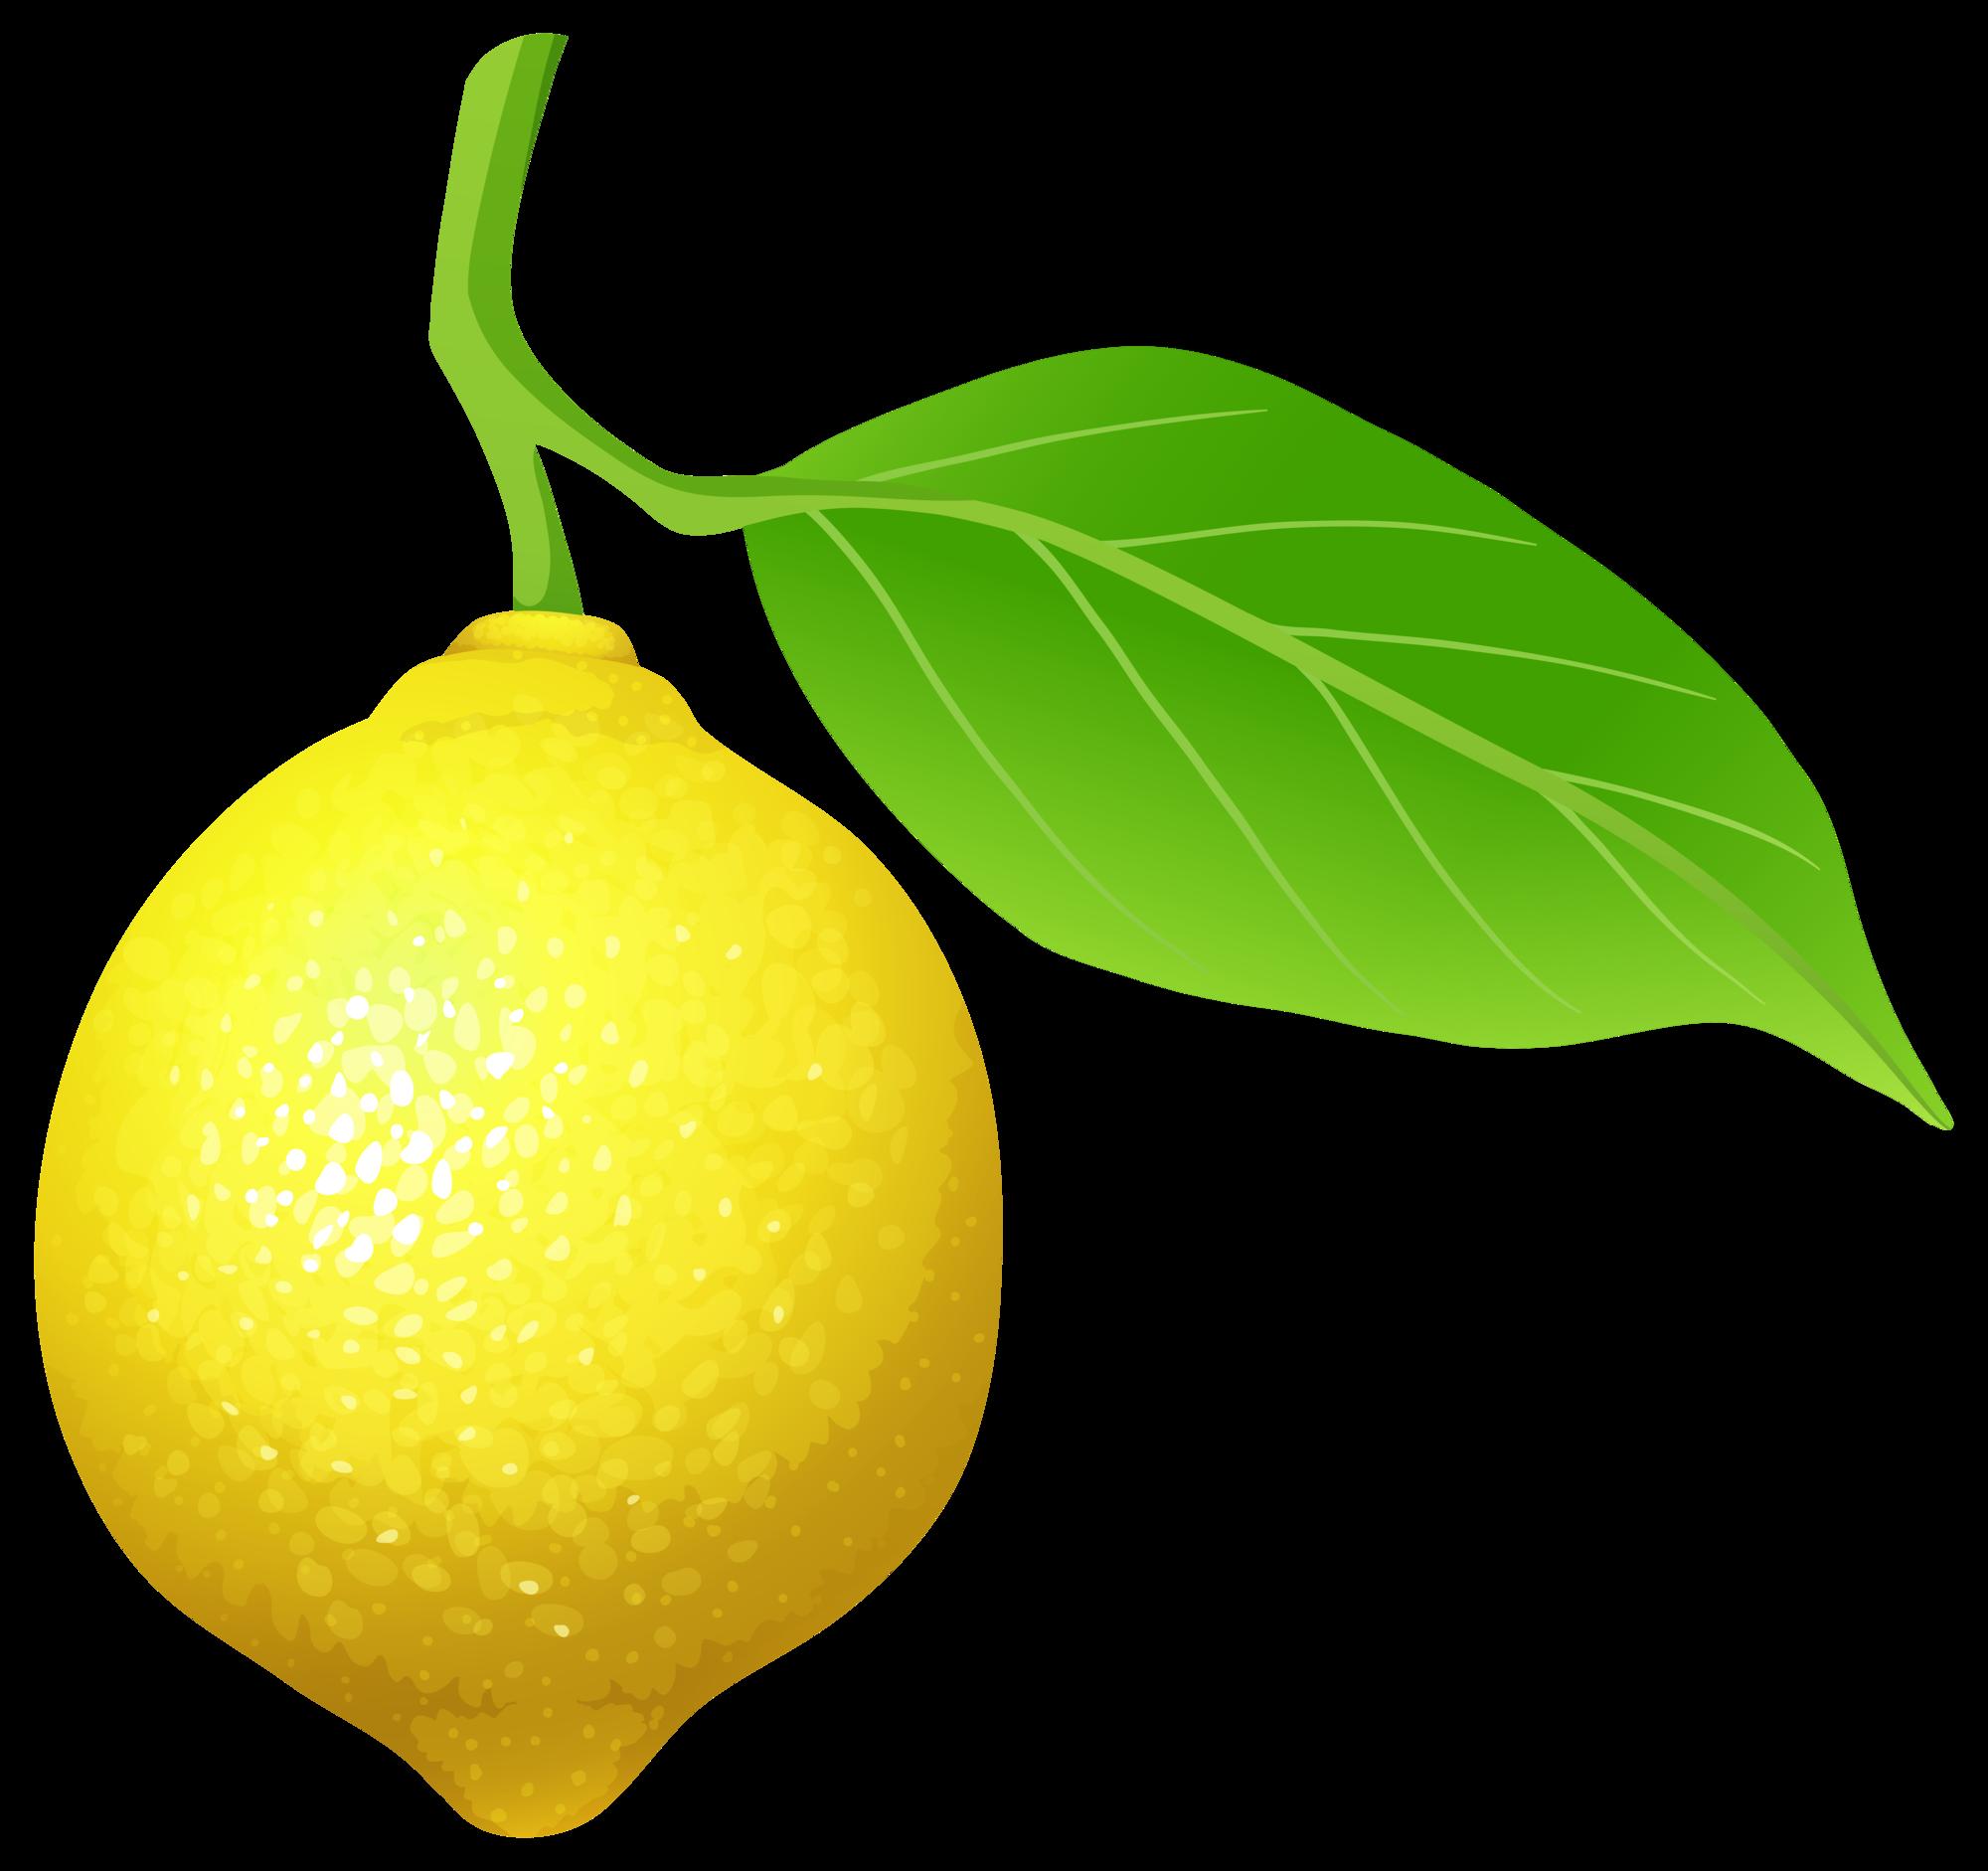 freeuse download Lime green lemon free. Lemons clipart.